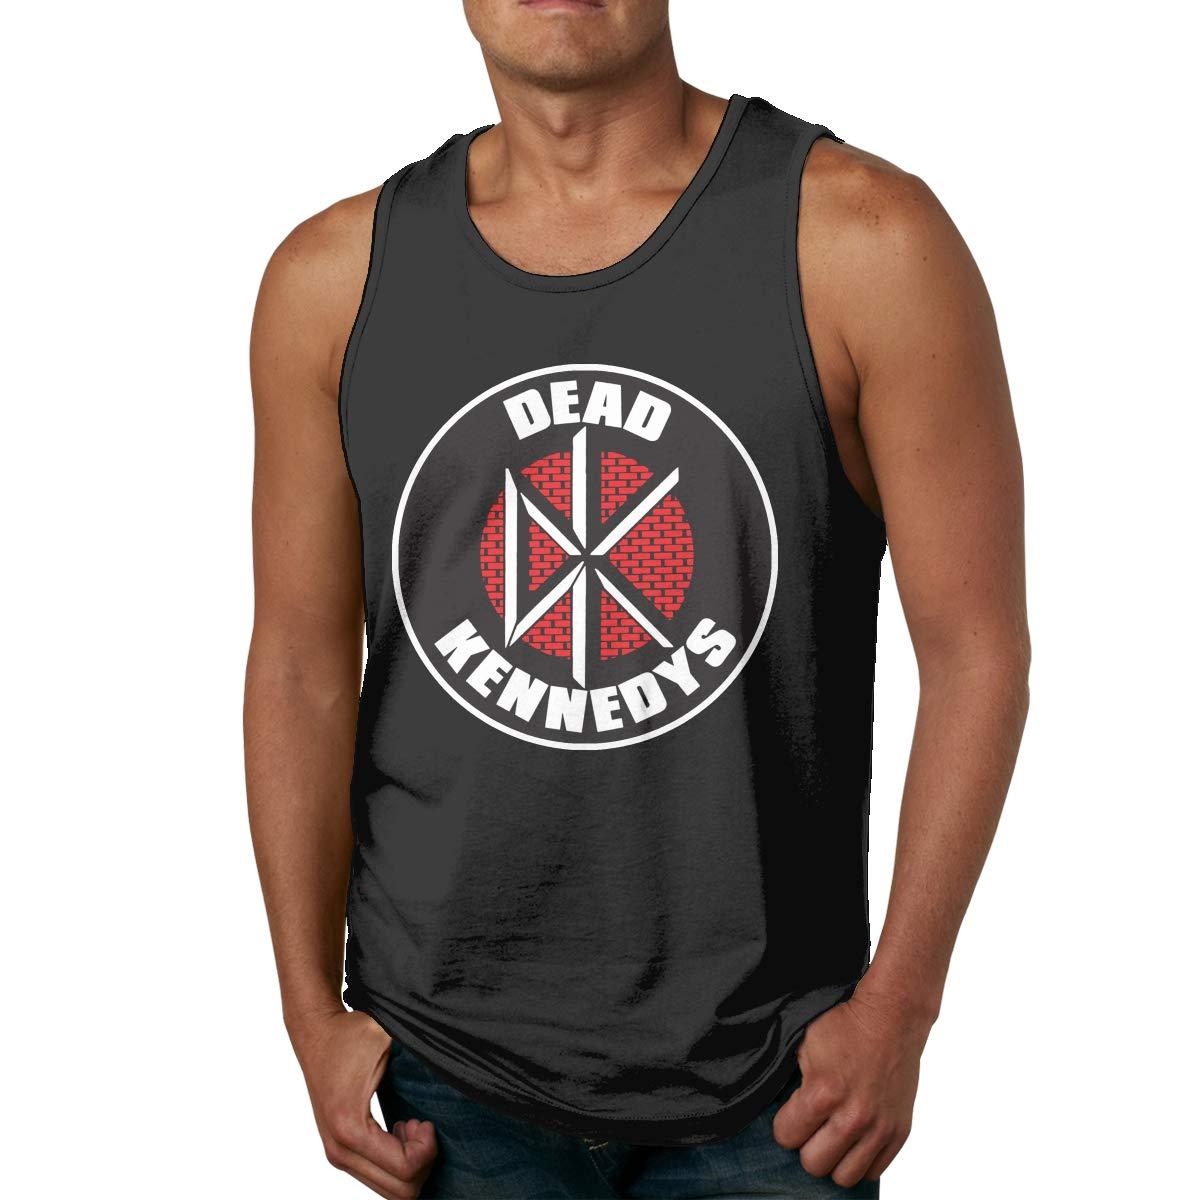 Starcl Dead Kennedys Brick Logo Mens Sleeveless Garment Tank Top Shirt Black